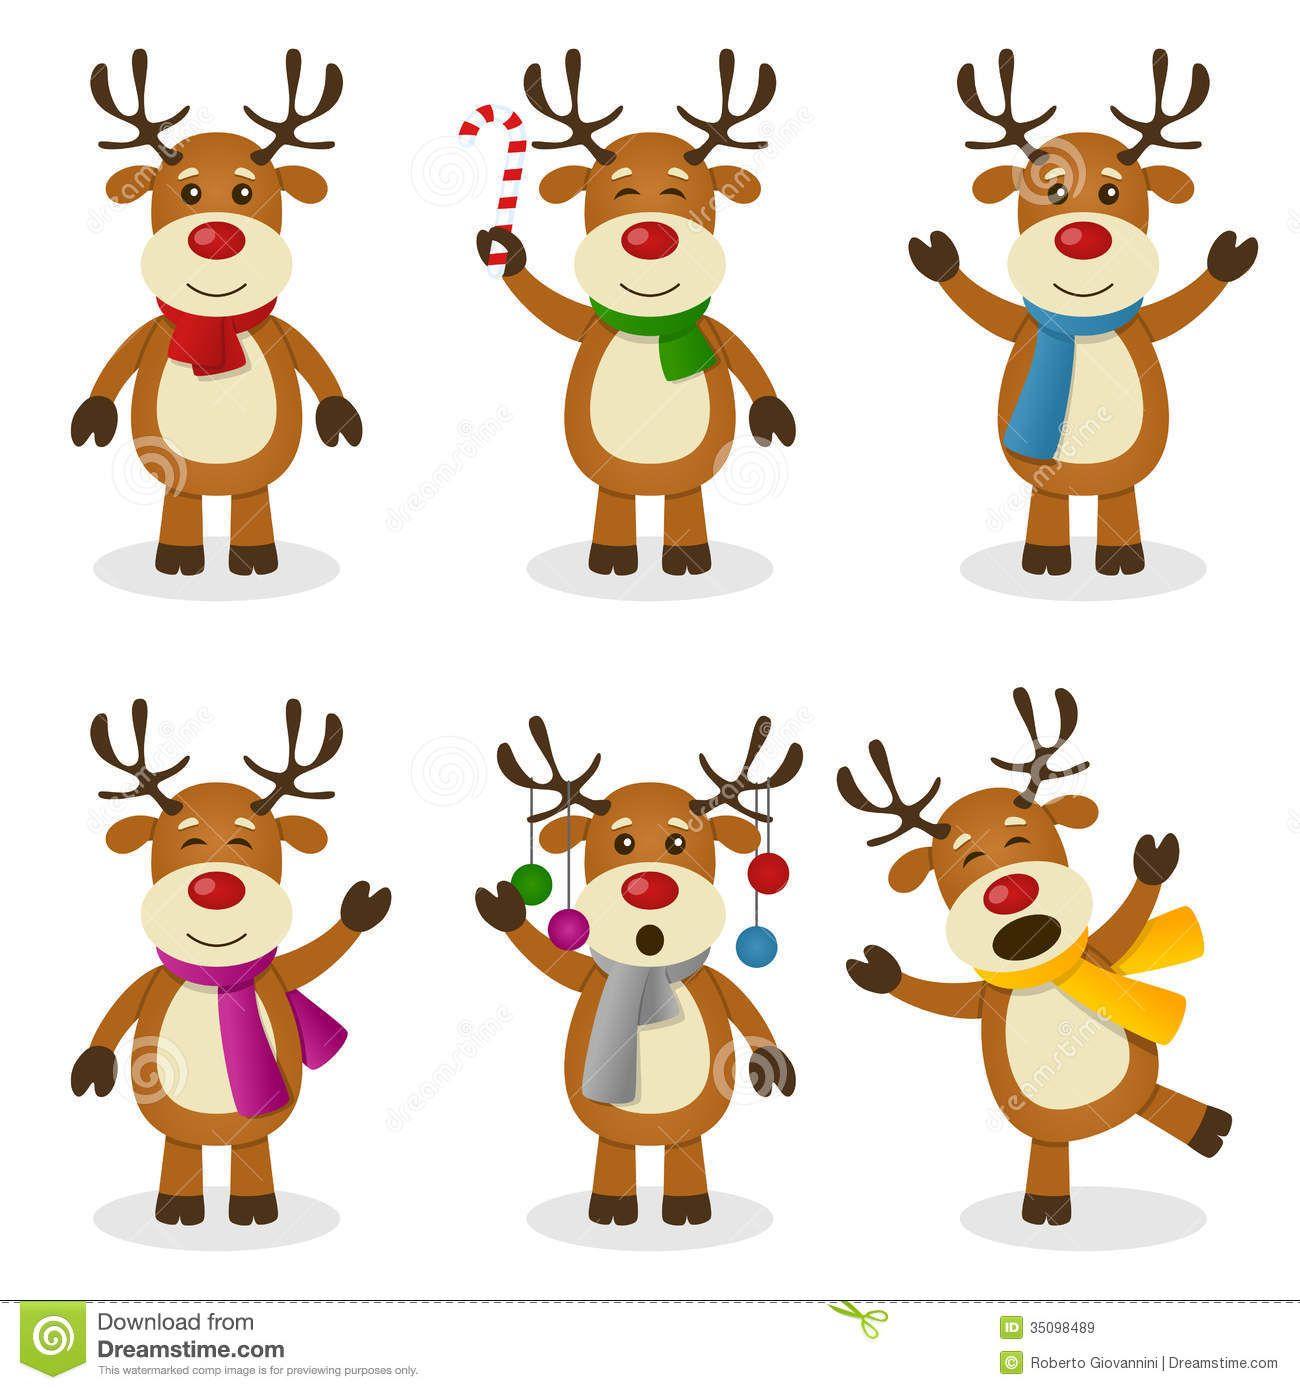 Reindeer Border Clipart Clipart Kid Christmas reindeer